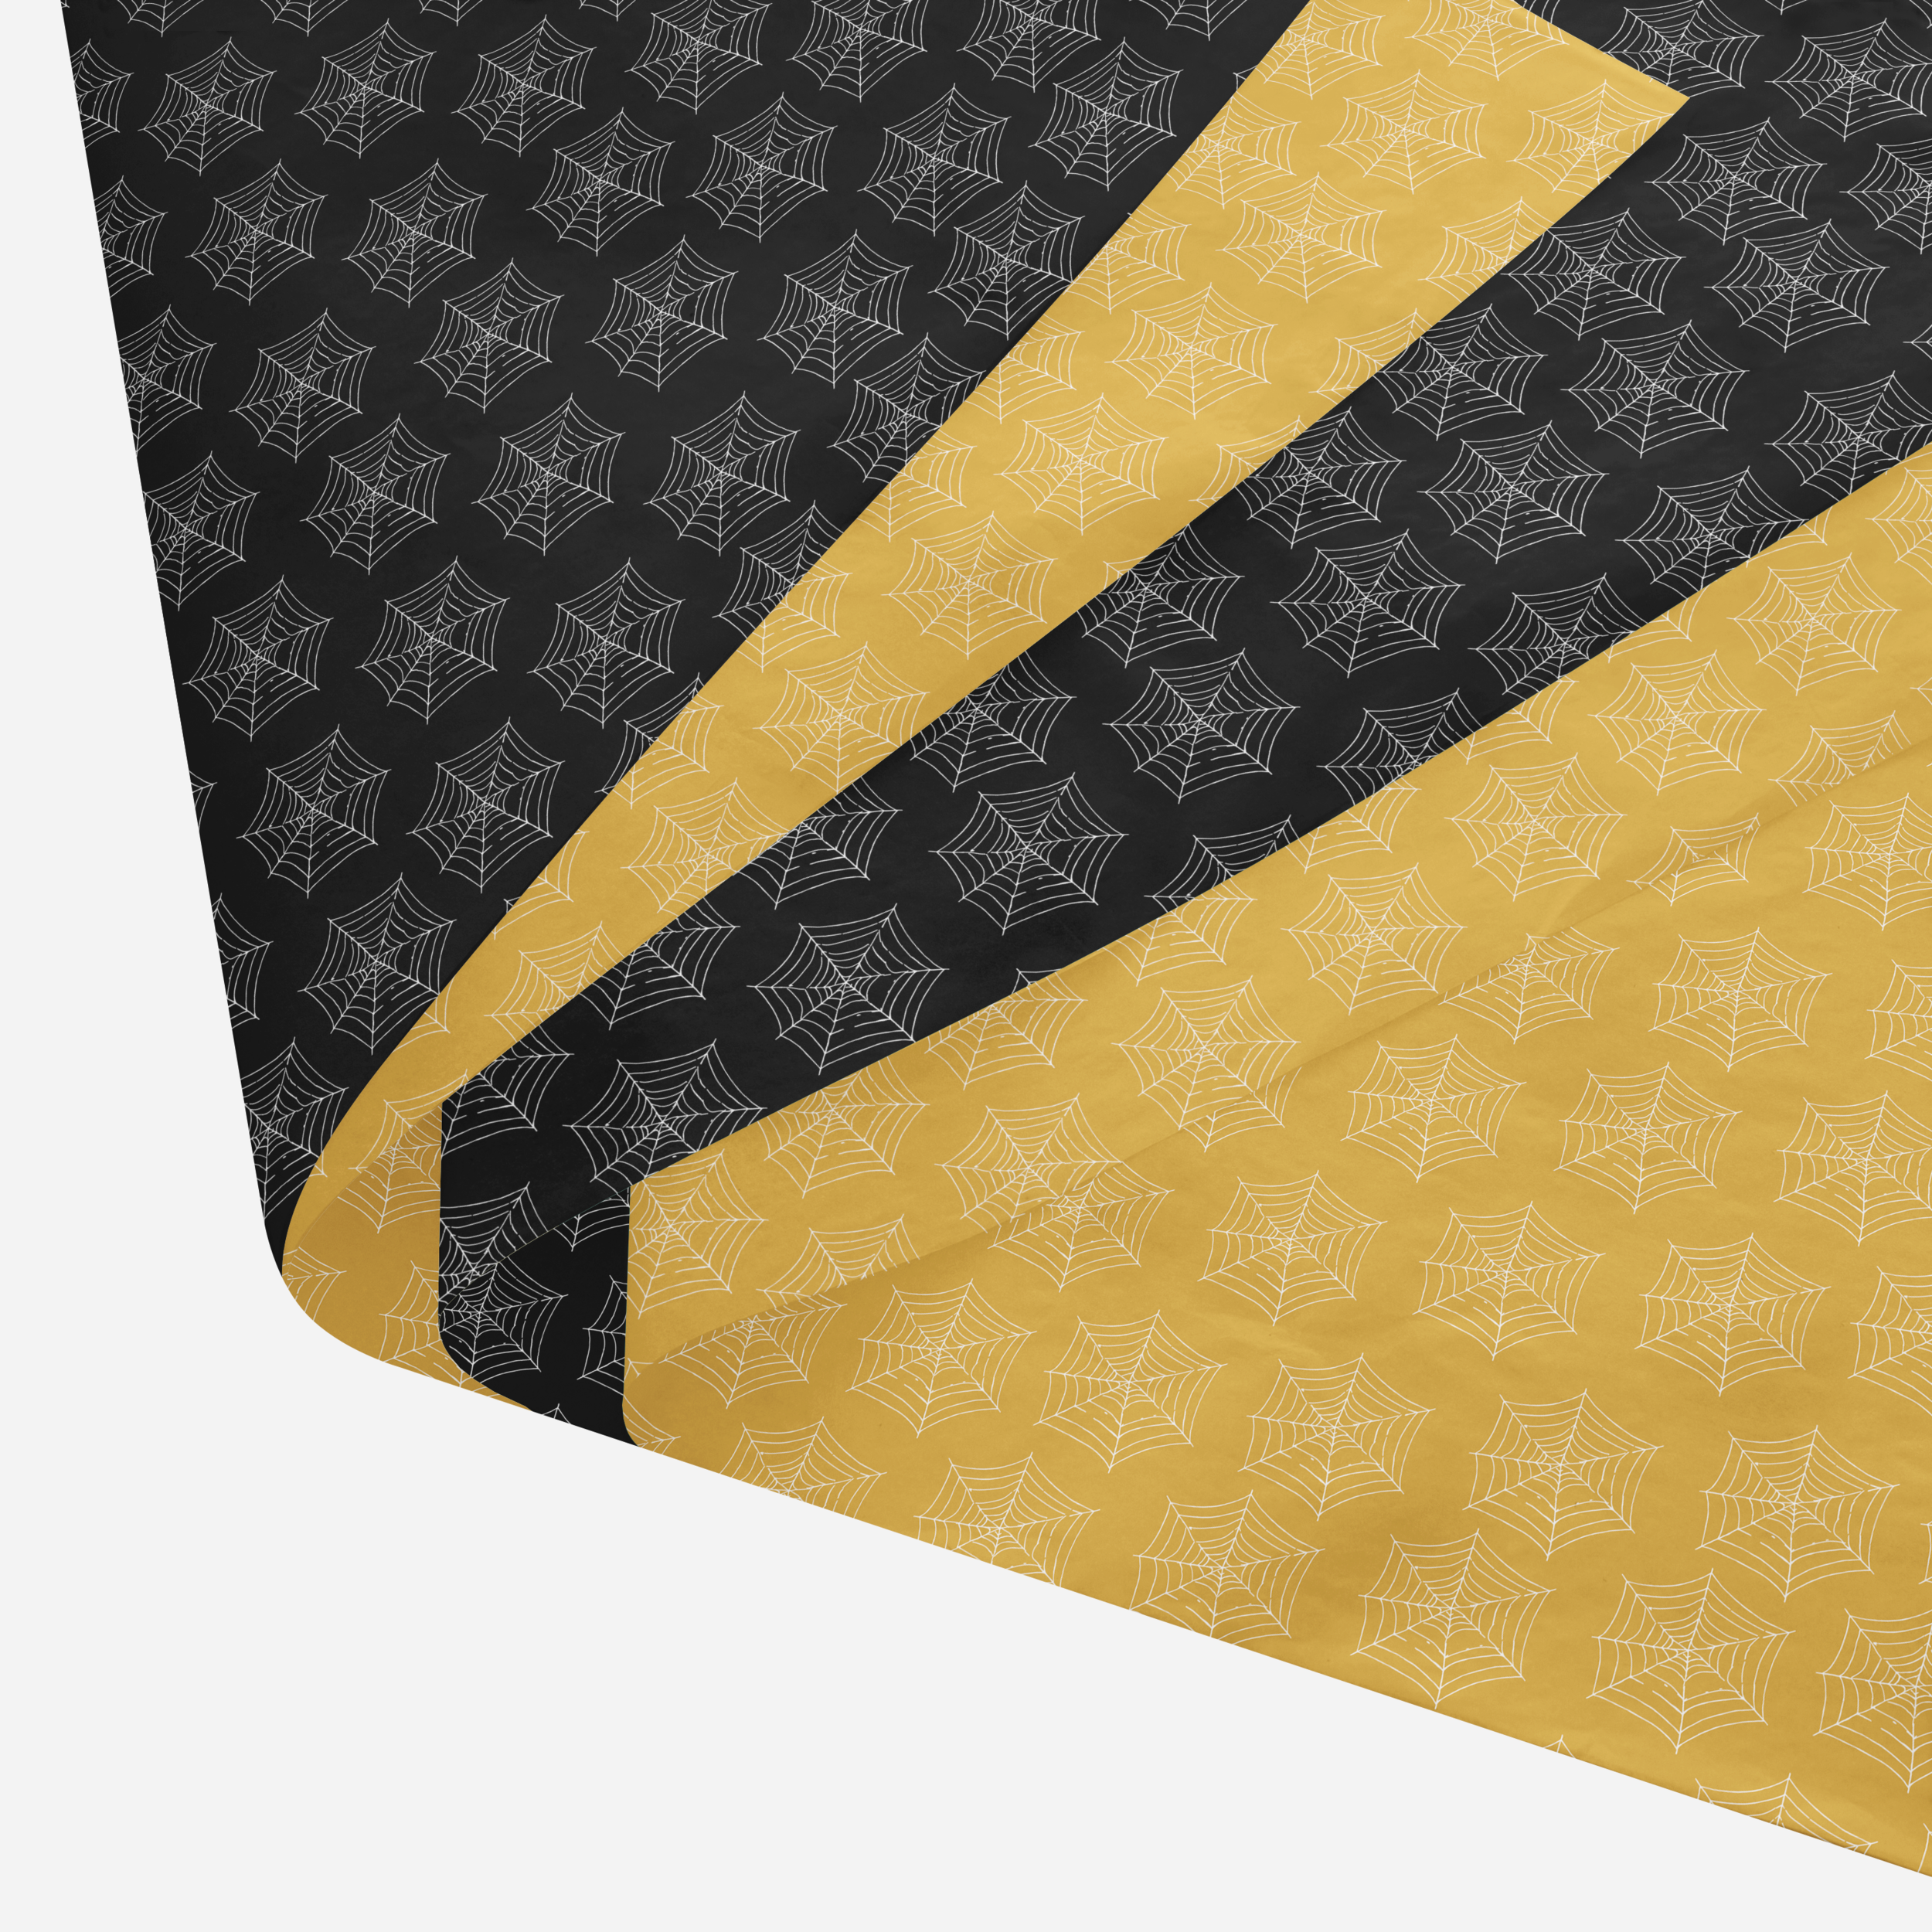 tissuepaper.png